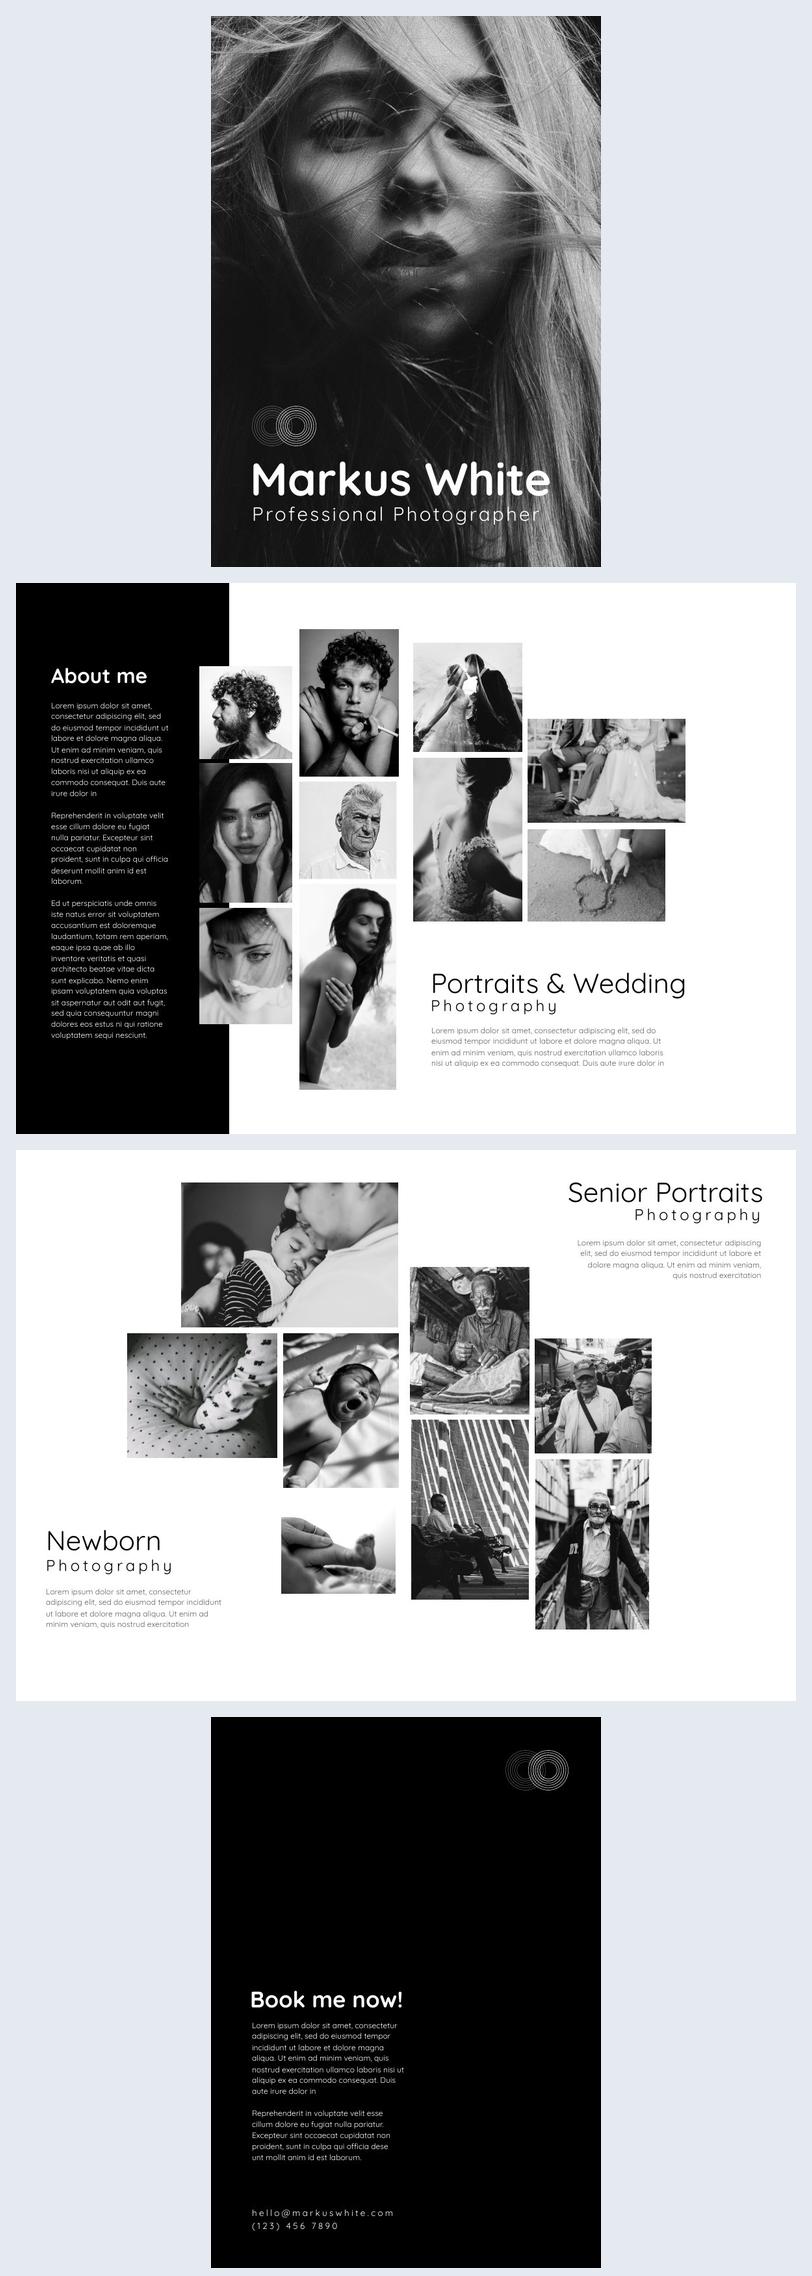 Black and White Photo Portfolio Template